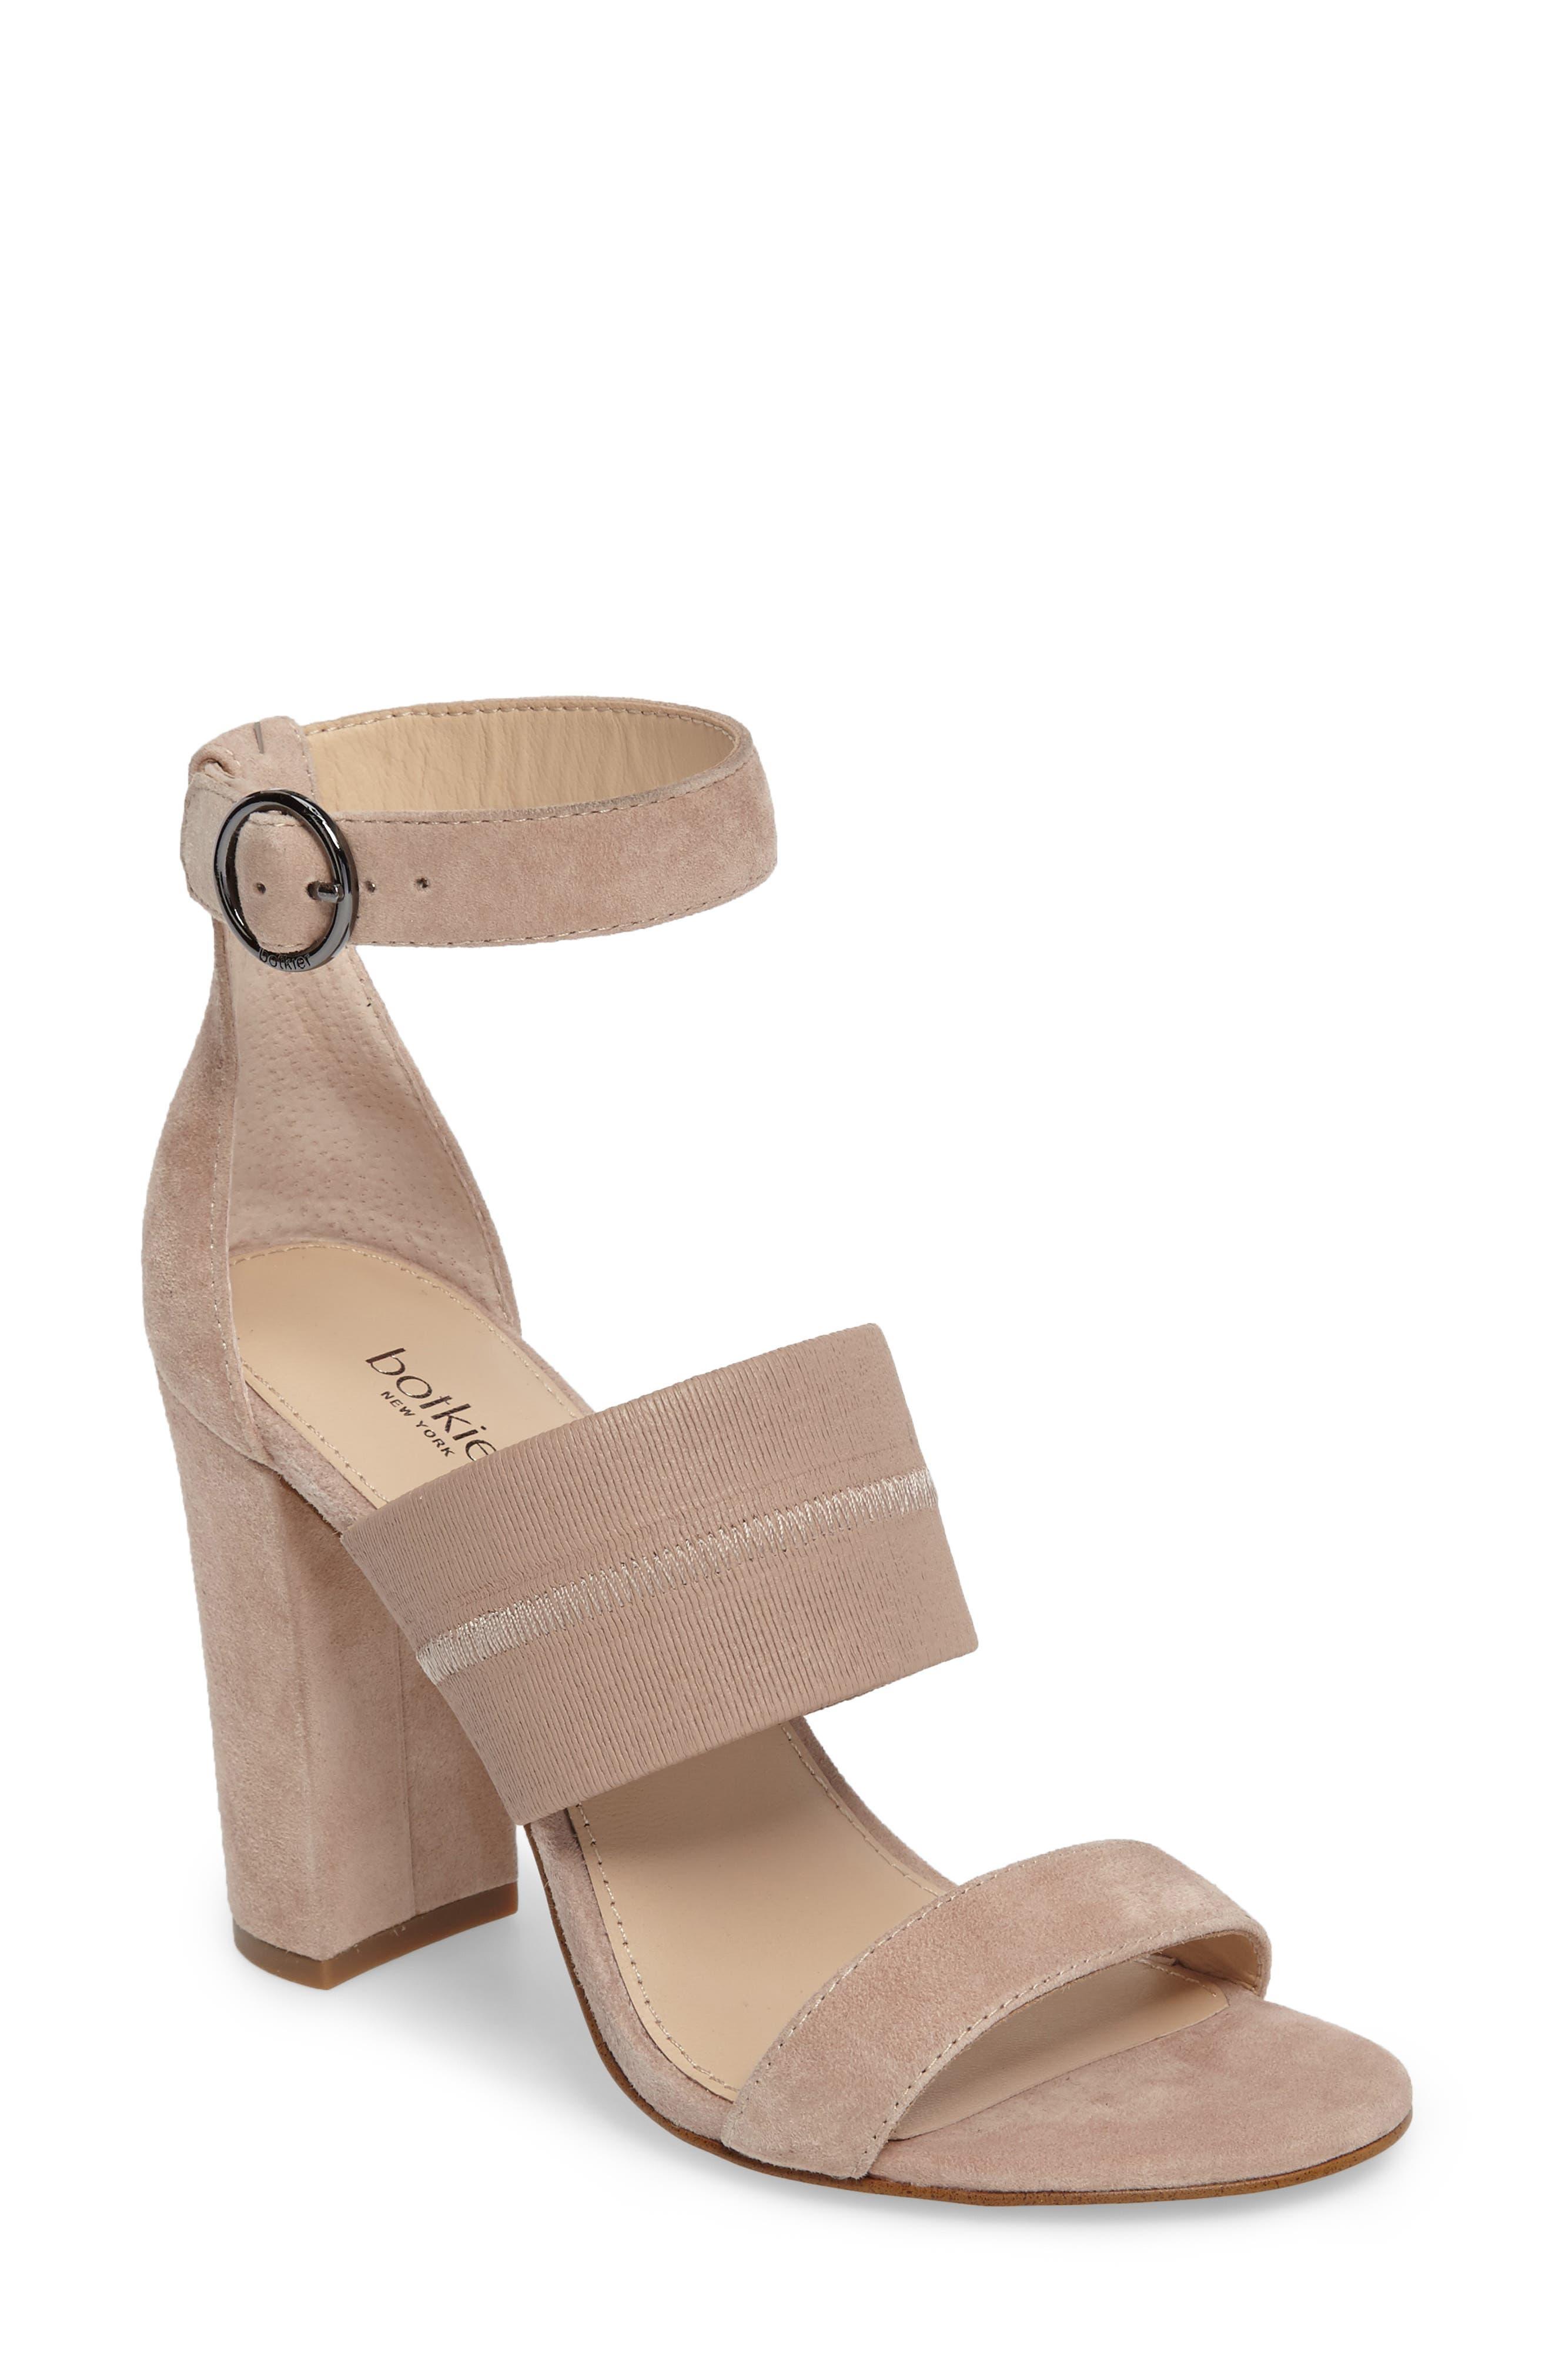 Alternate Image 1 Selected - Botkier Gisella Ankle Strap Sandal (Women)